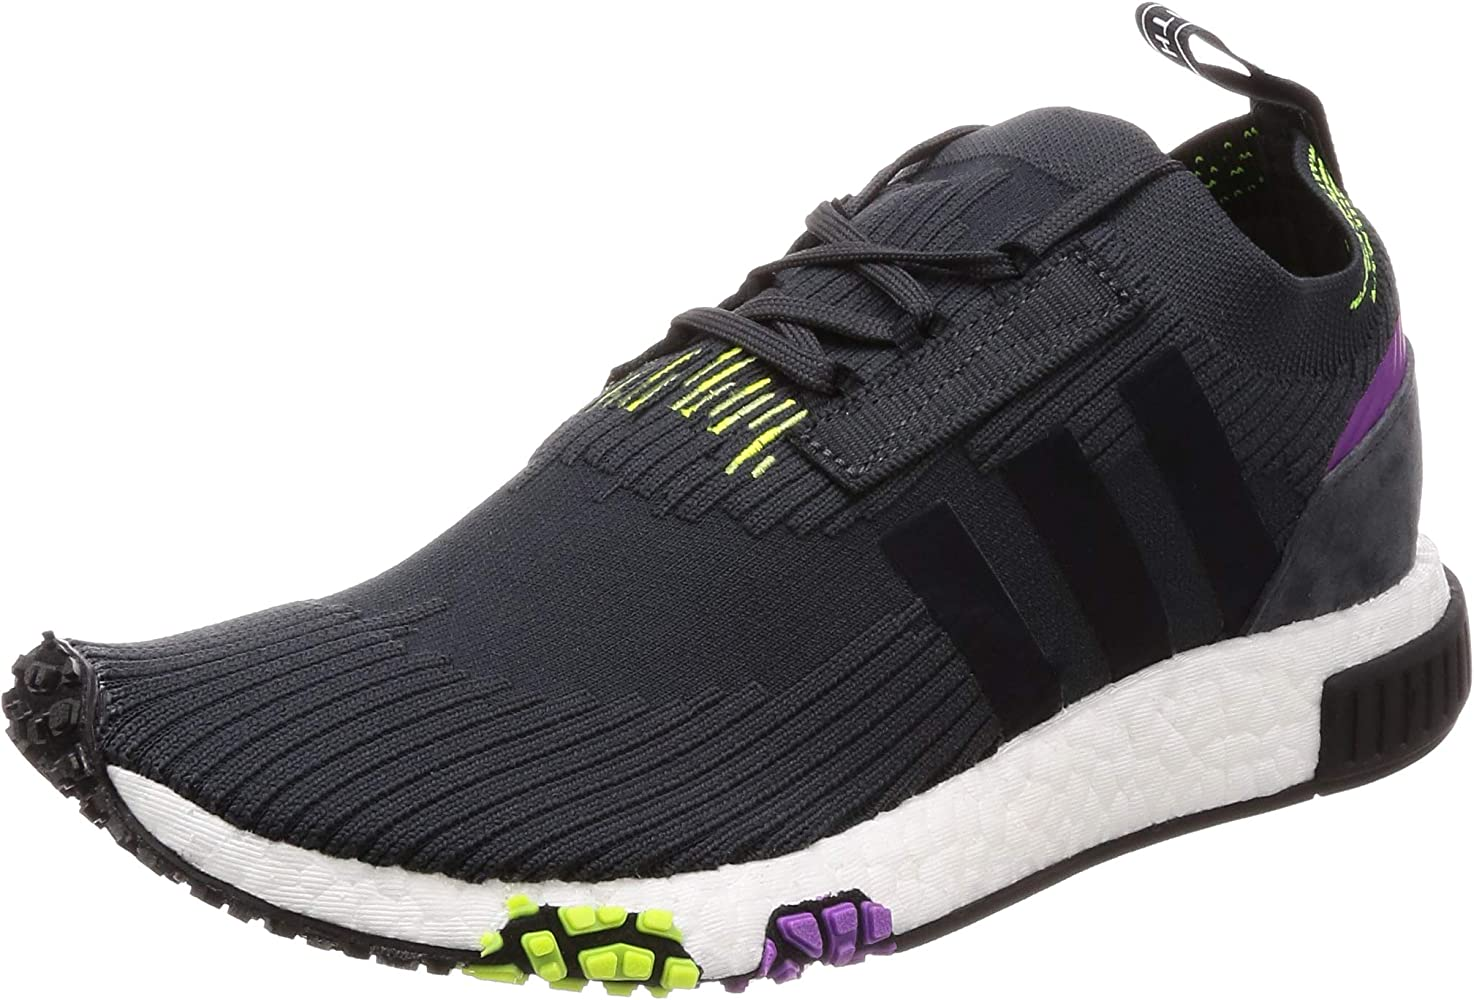 adidas B37640 Carbon Size:4: : Schuhe & Handtaschen